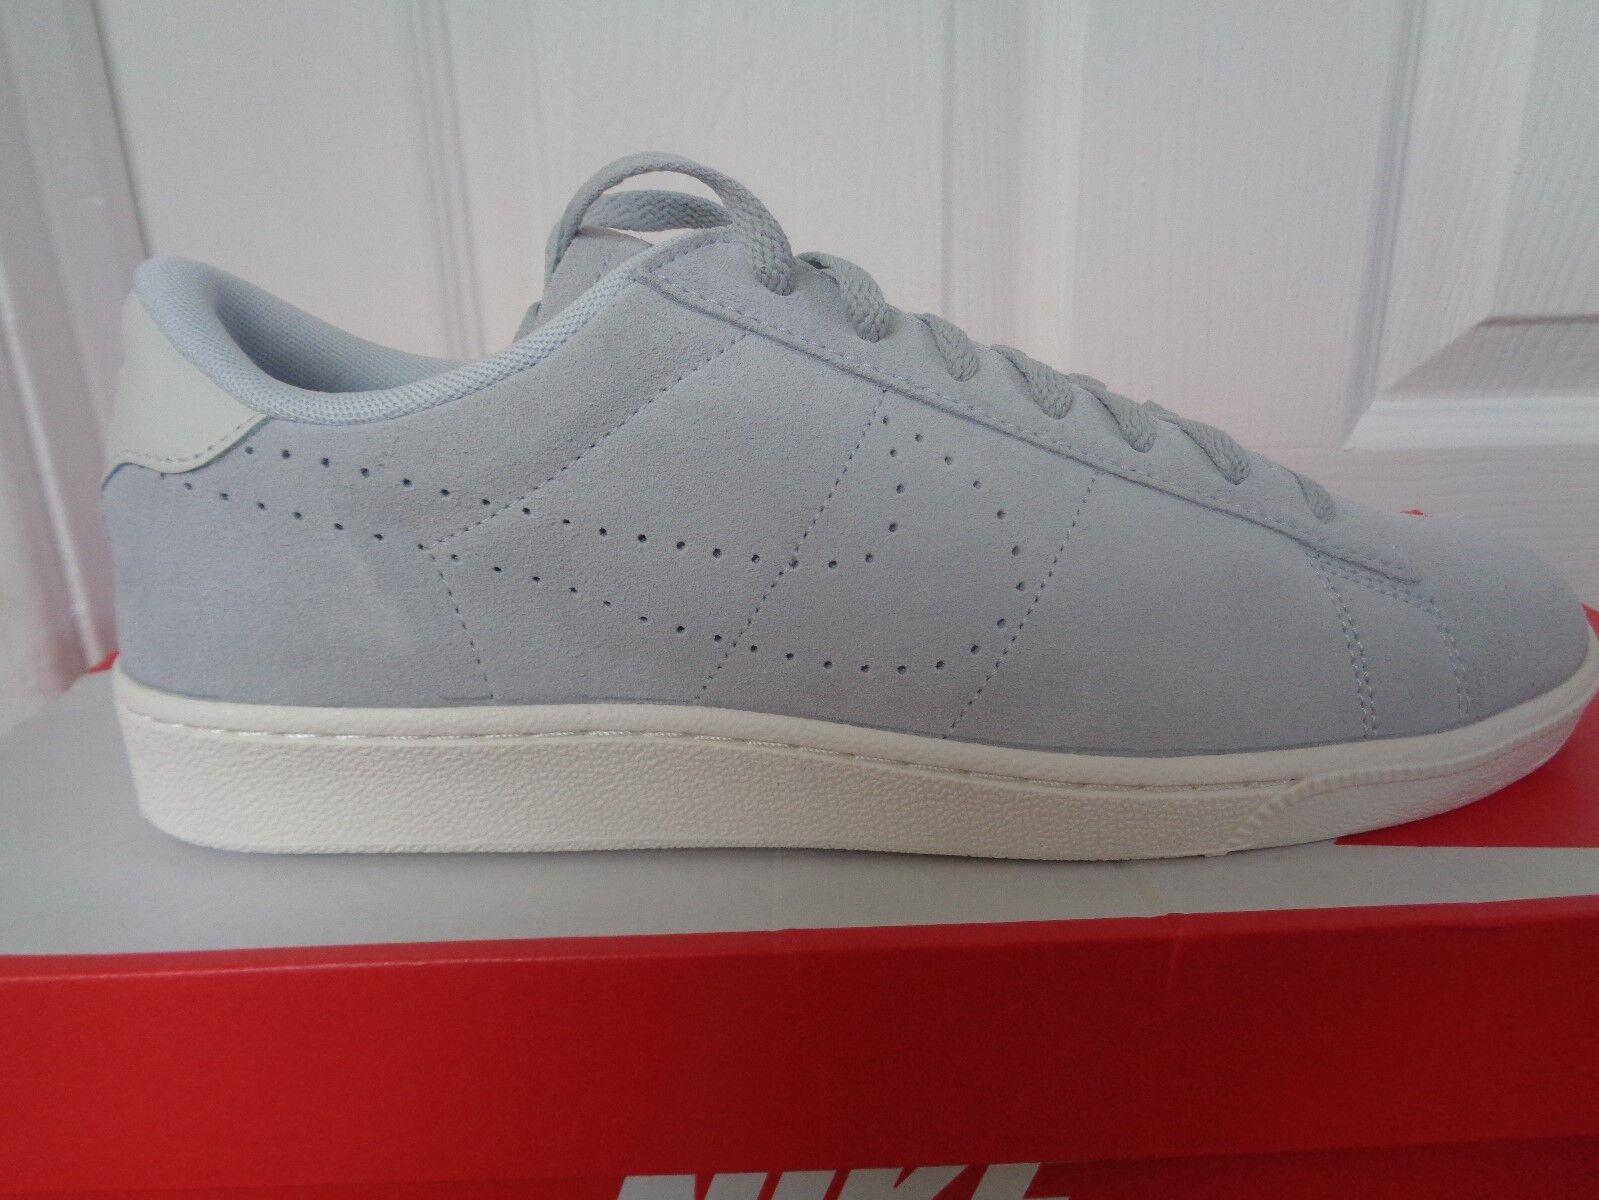 Nike Tennis classic CS Suede homme  10 trainers 829351 001 uk 10  eu 45 us 11 NEW+BOX dfe596